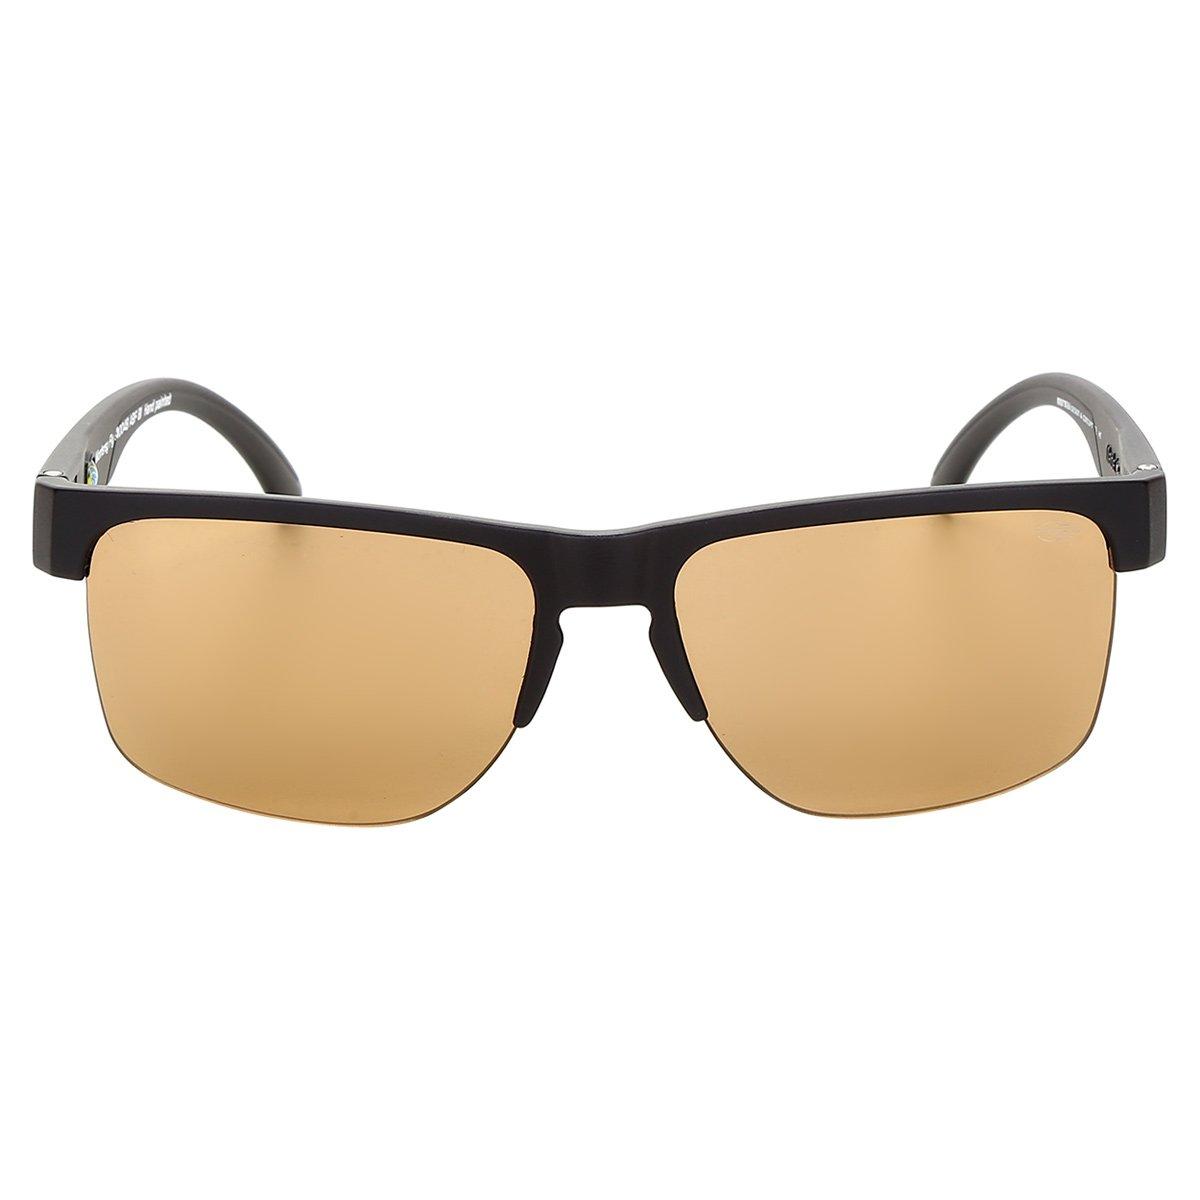 Óculos de Sol Mormaii Monterey Fly Masculino - Compre Agora   Zattini 4294cfe1c4